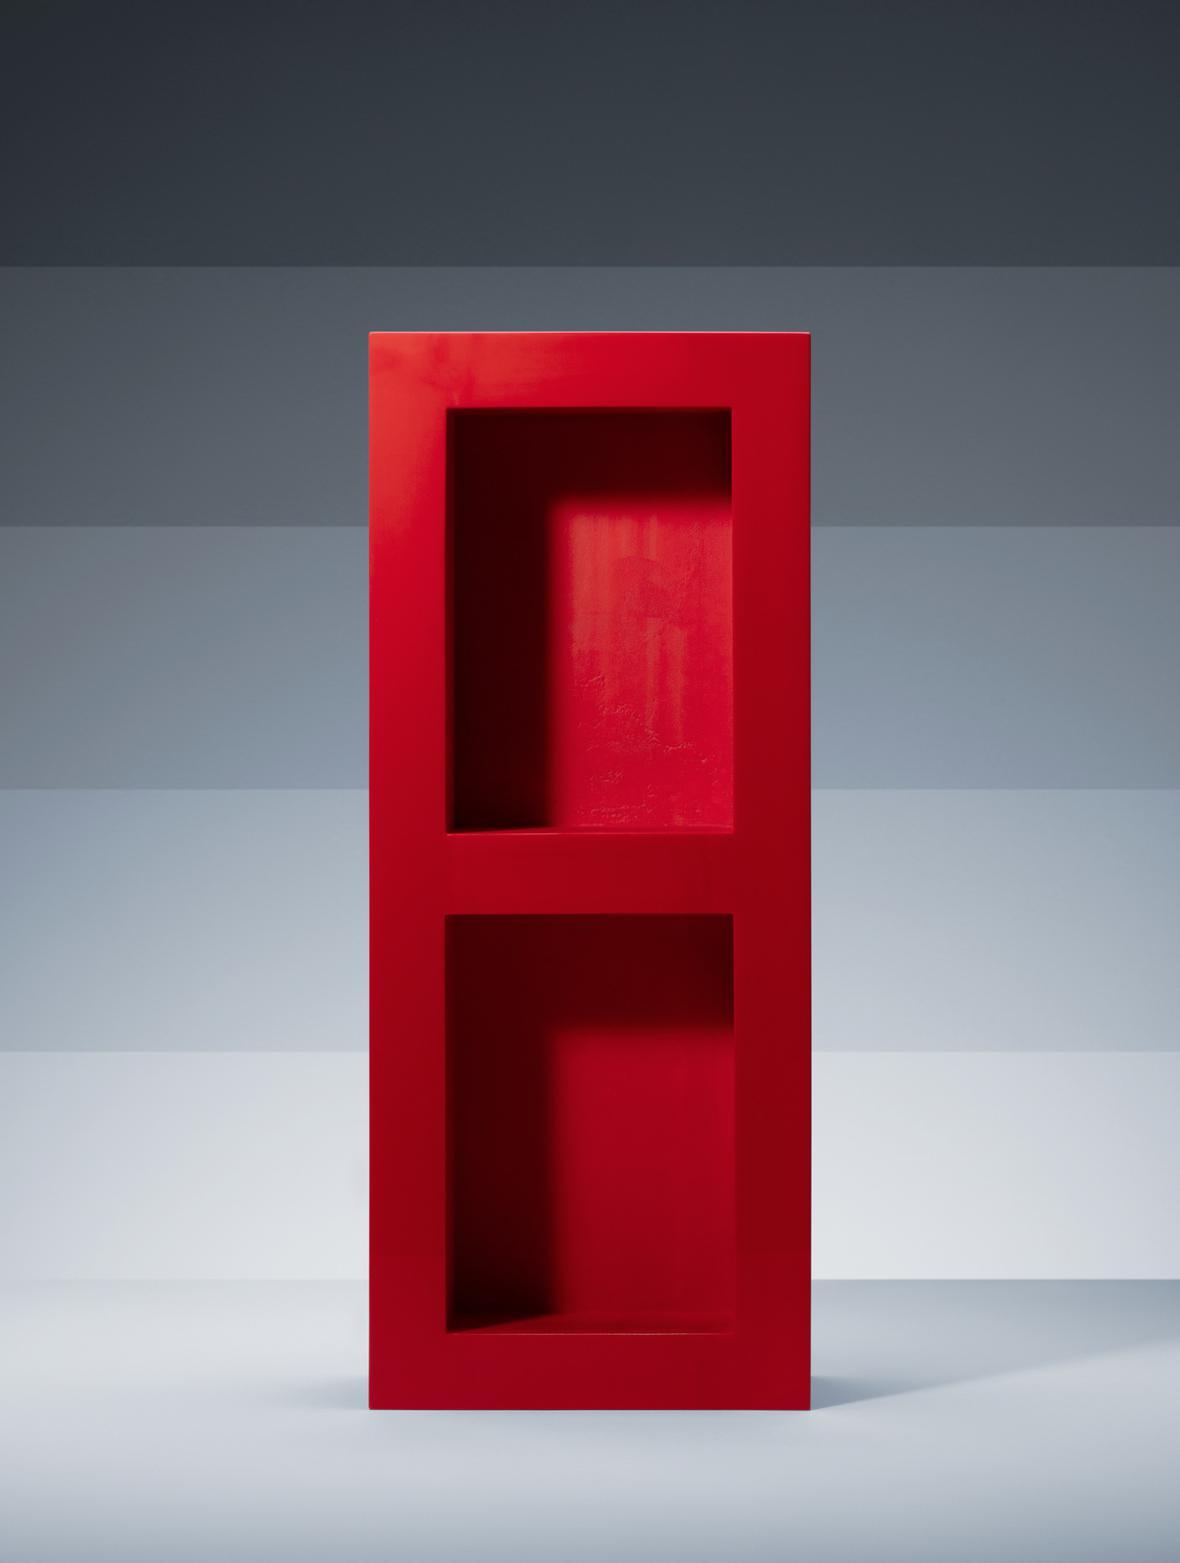 Rony Plesl / Minimal, 2005